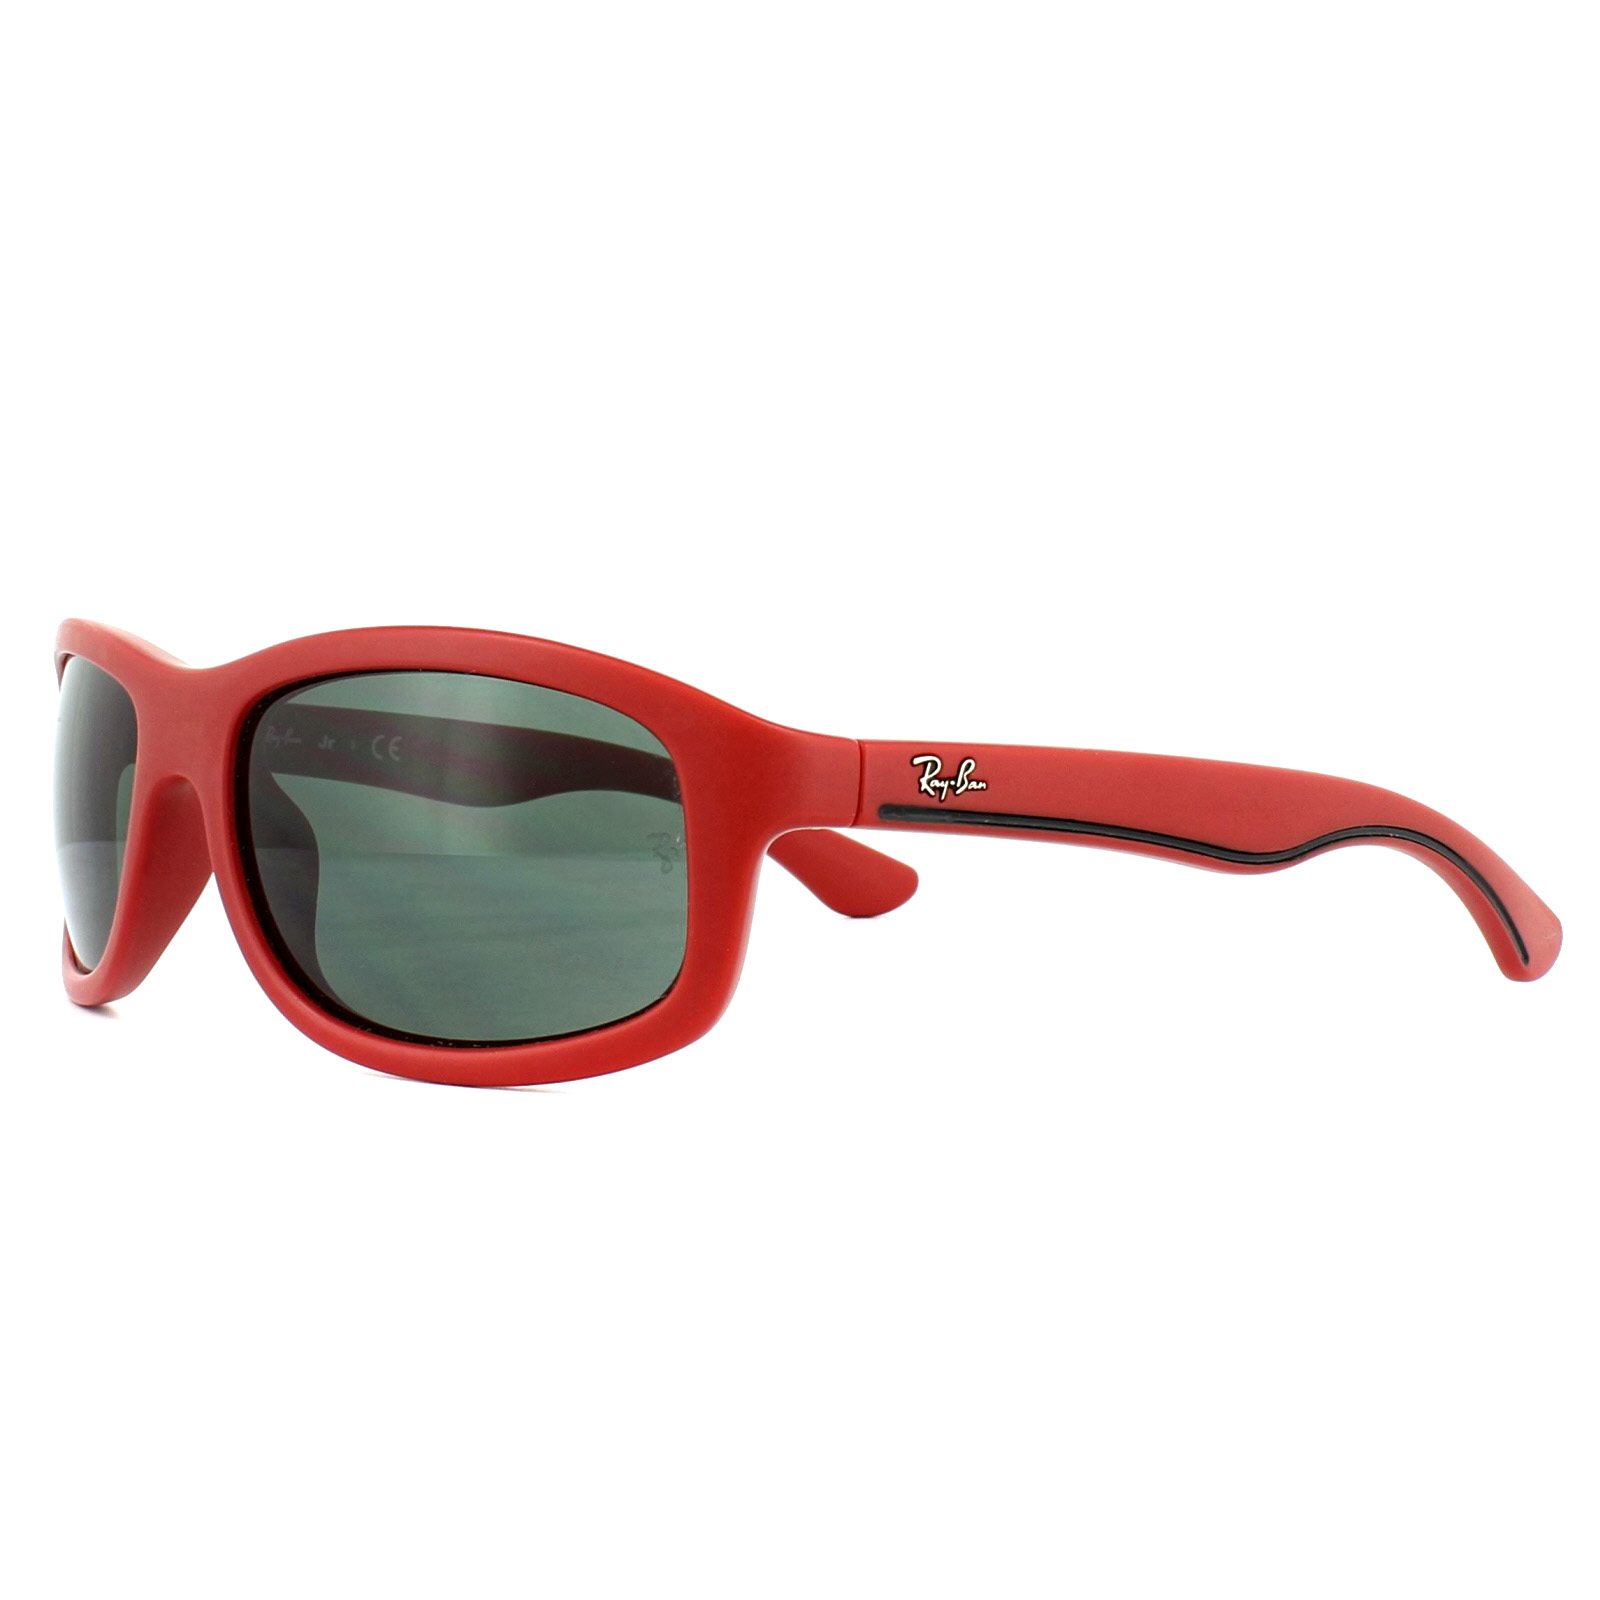 f016267011 Sentinel Ray-Ban Junior Sunglasses 9058S 700271 Red Grey. Sentinel  Thumbnail 2